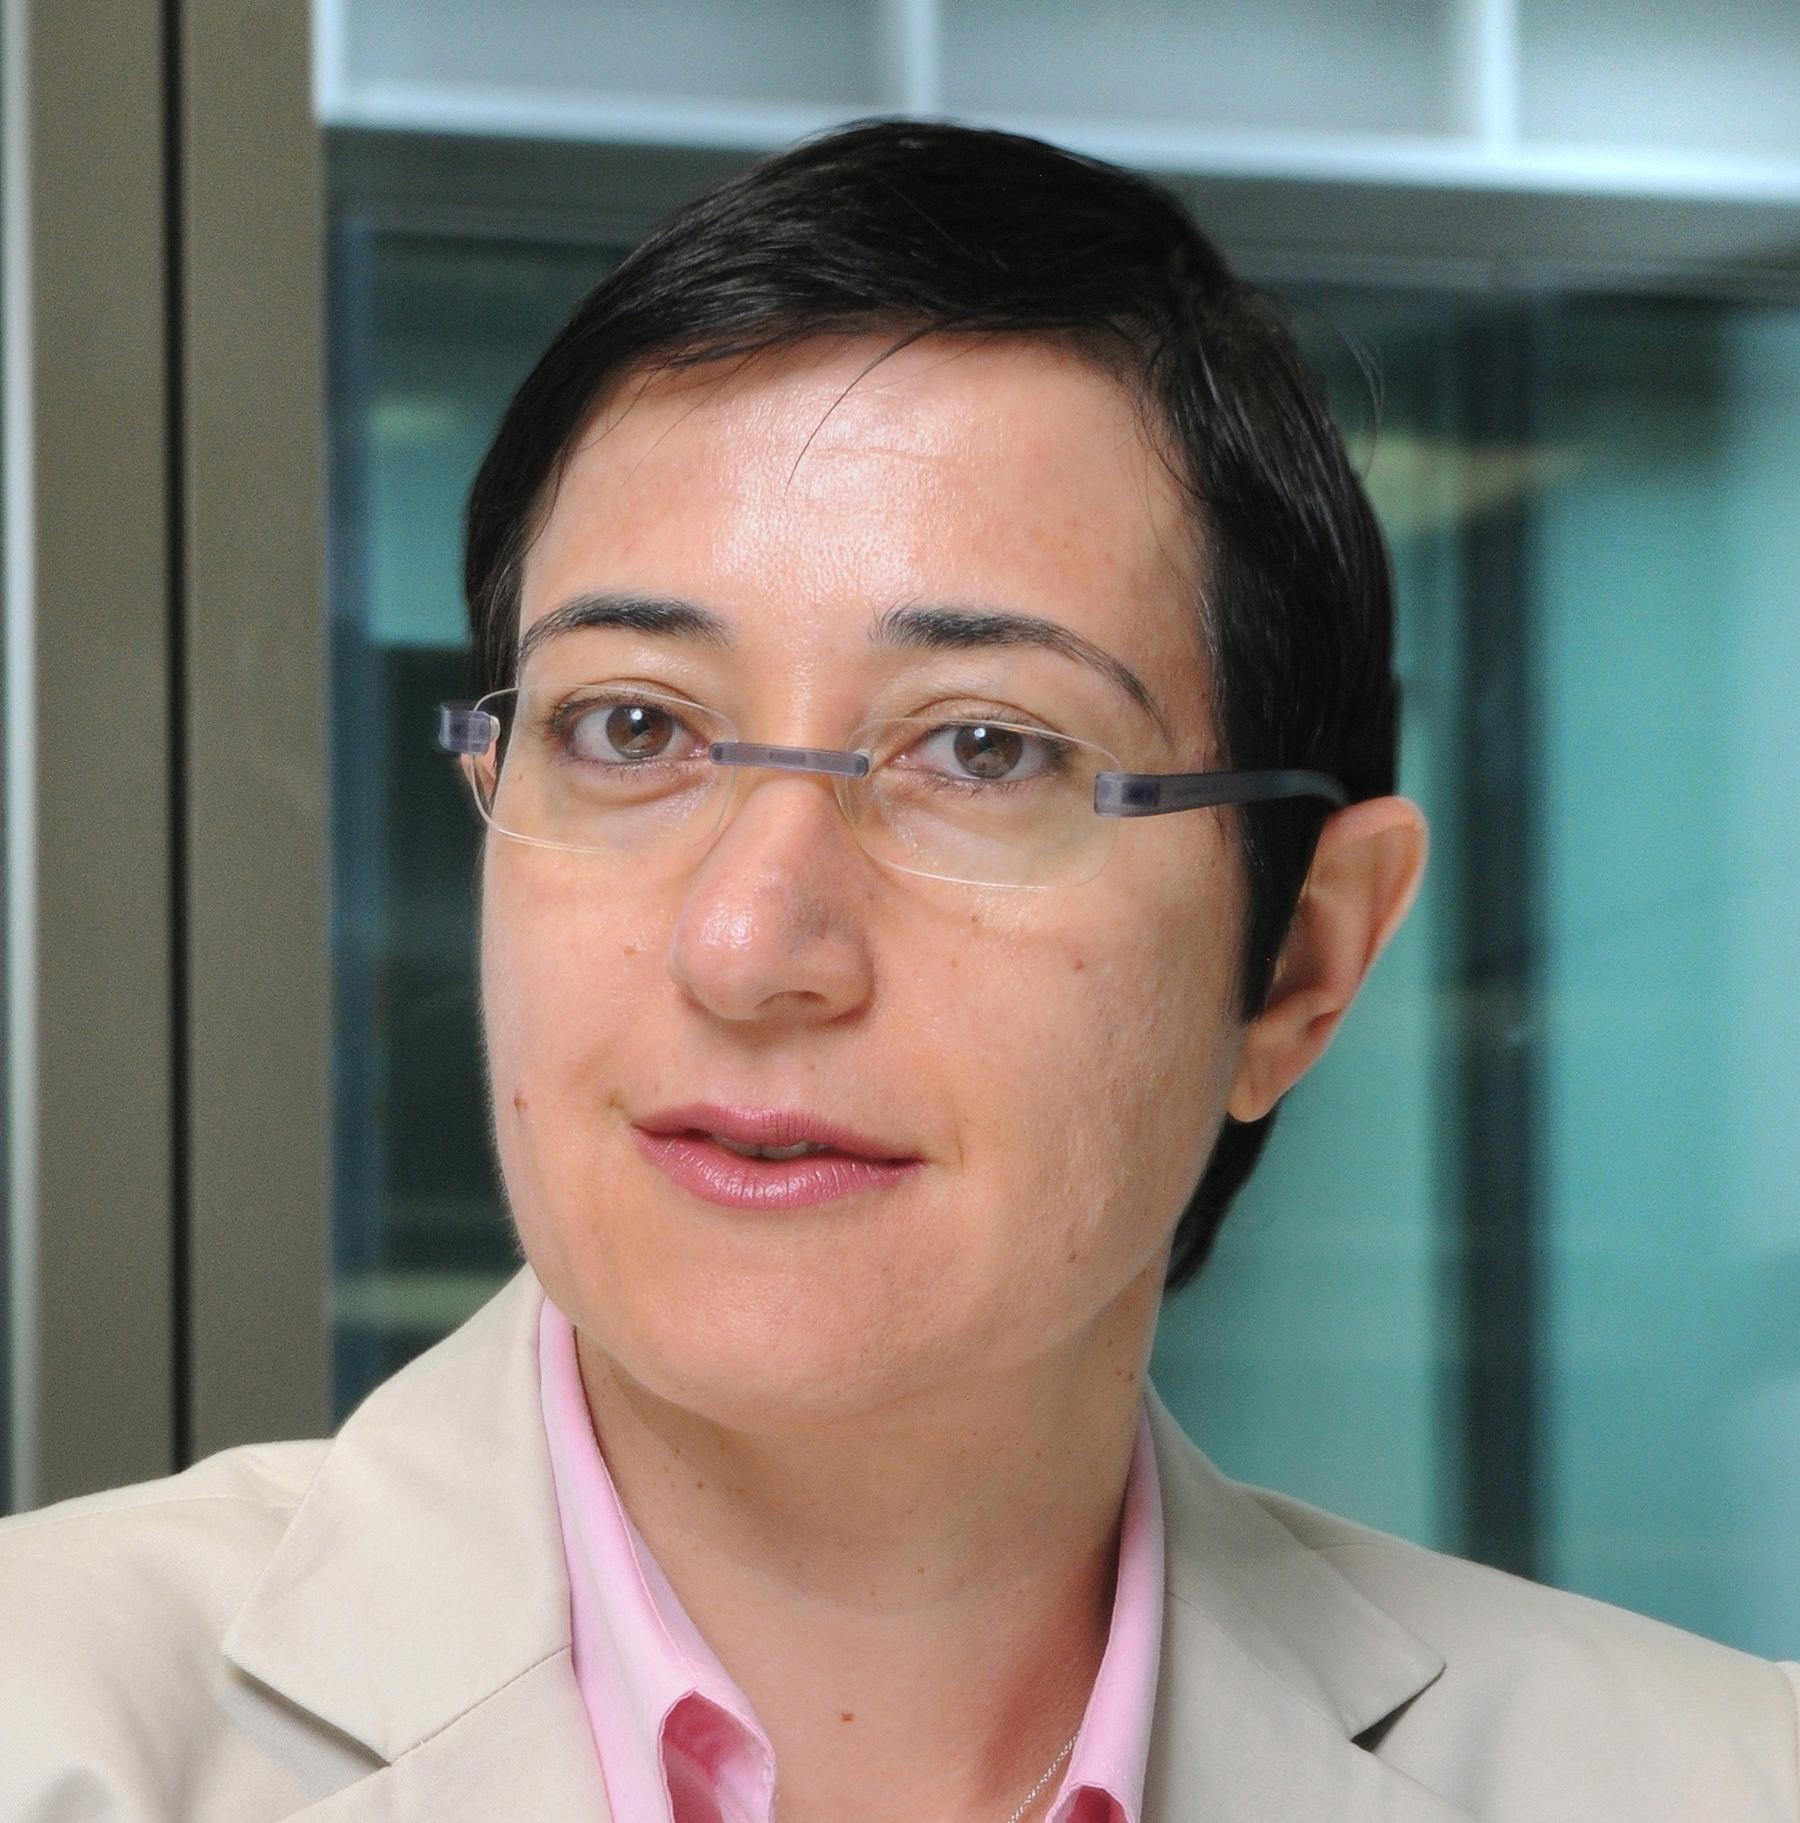 Ms. Orli Arav. Photo: EnergyNet